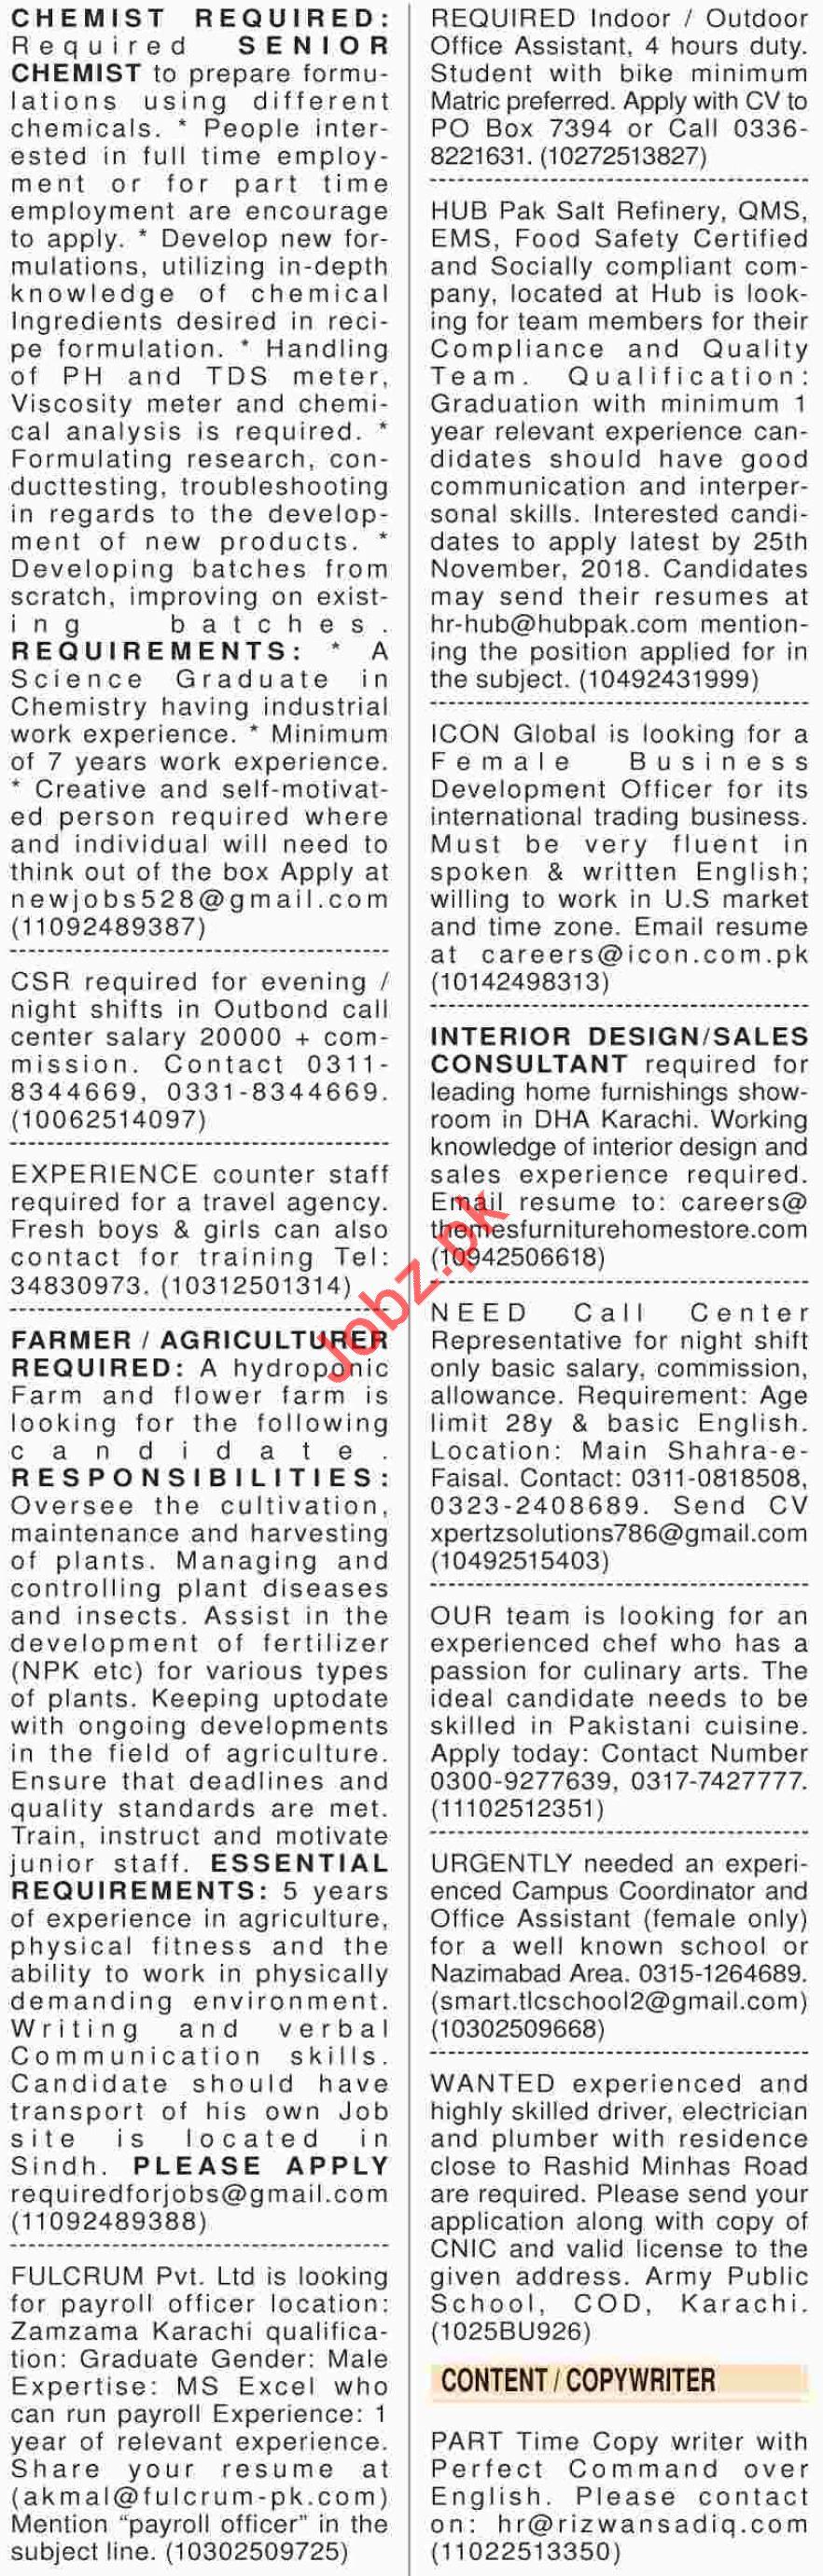 Dawn Sunday Newspaper Classified Ads 18/11/2018